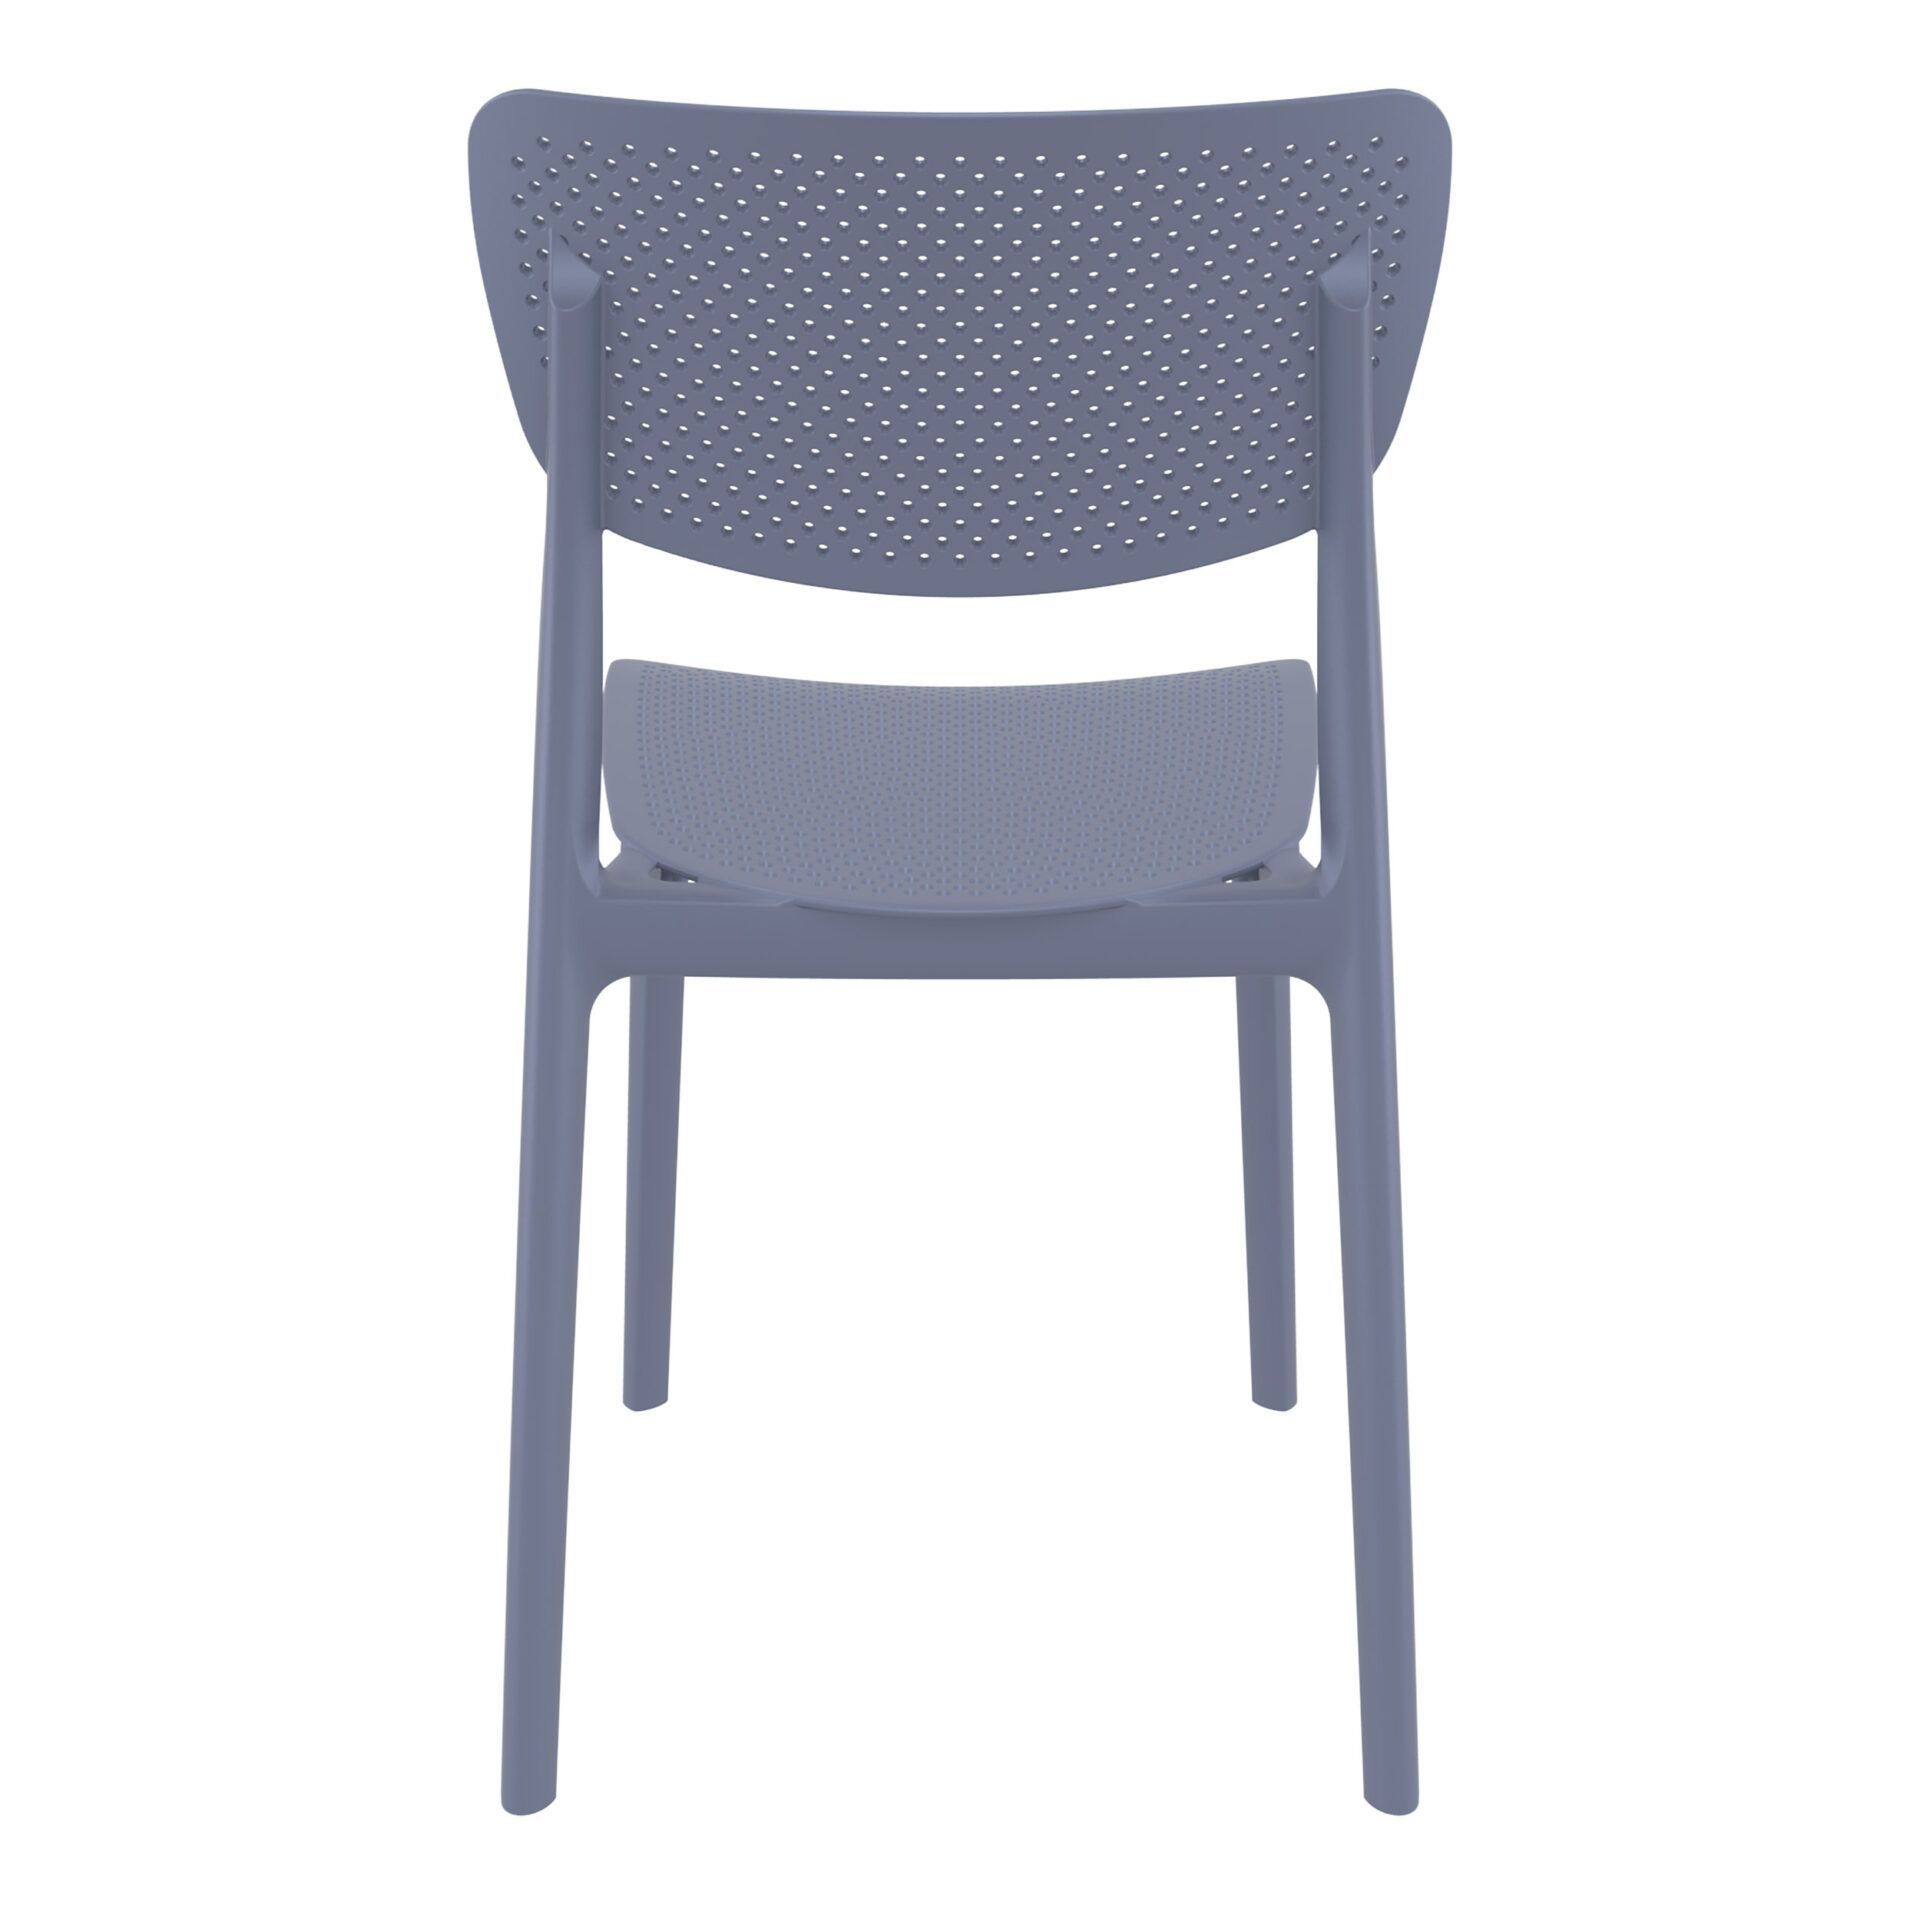 polypropylene hospitality seating lucy chair darkgrey back